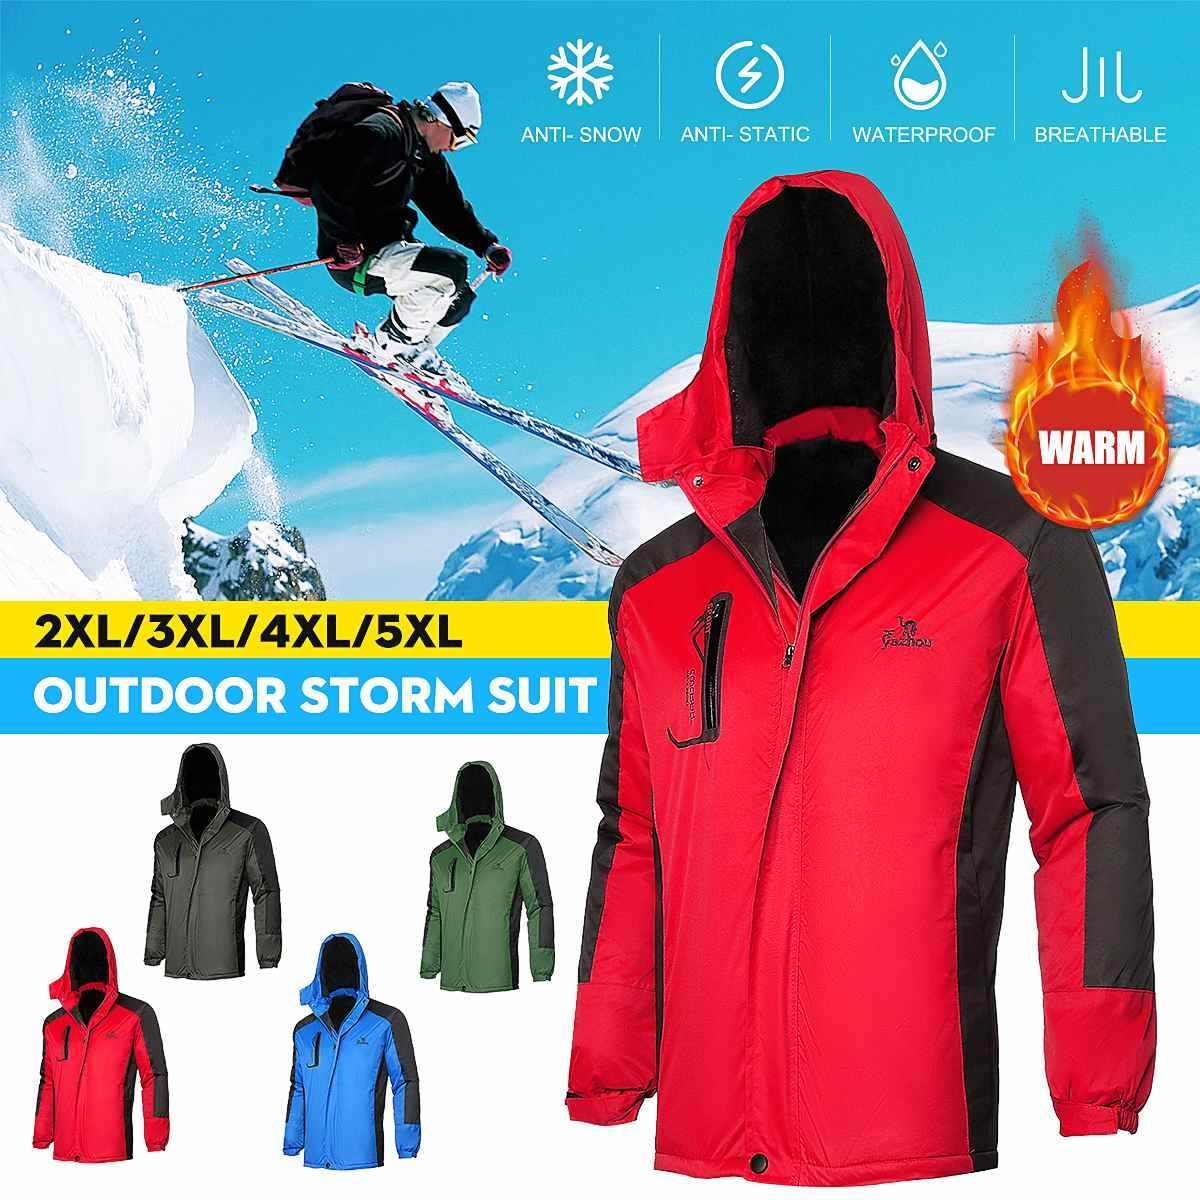 Ski Jaket Bulu Berjajar Tahan Air Salju Mantel Outdoor Hiking Snowboard Wwindproof Kain Hangat Musim Dingin Salju Mendaki Pakaian